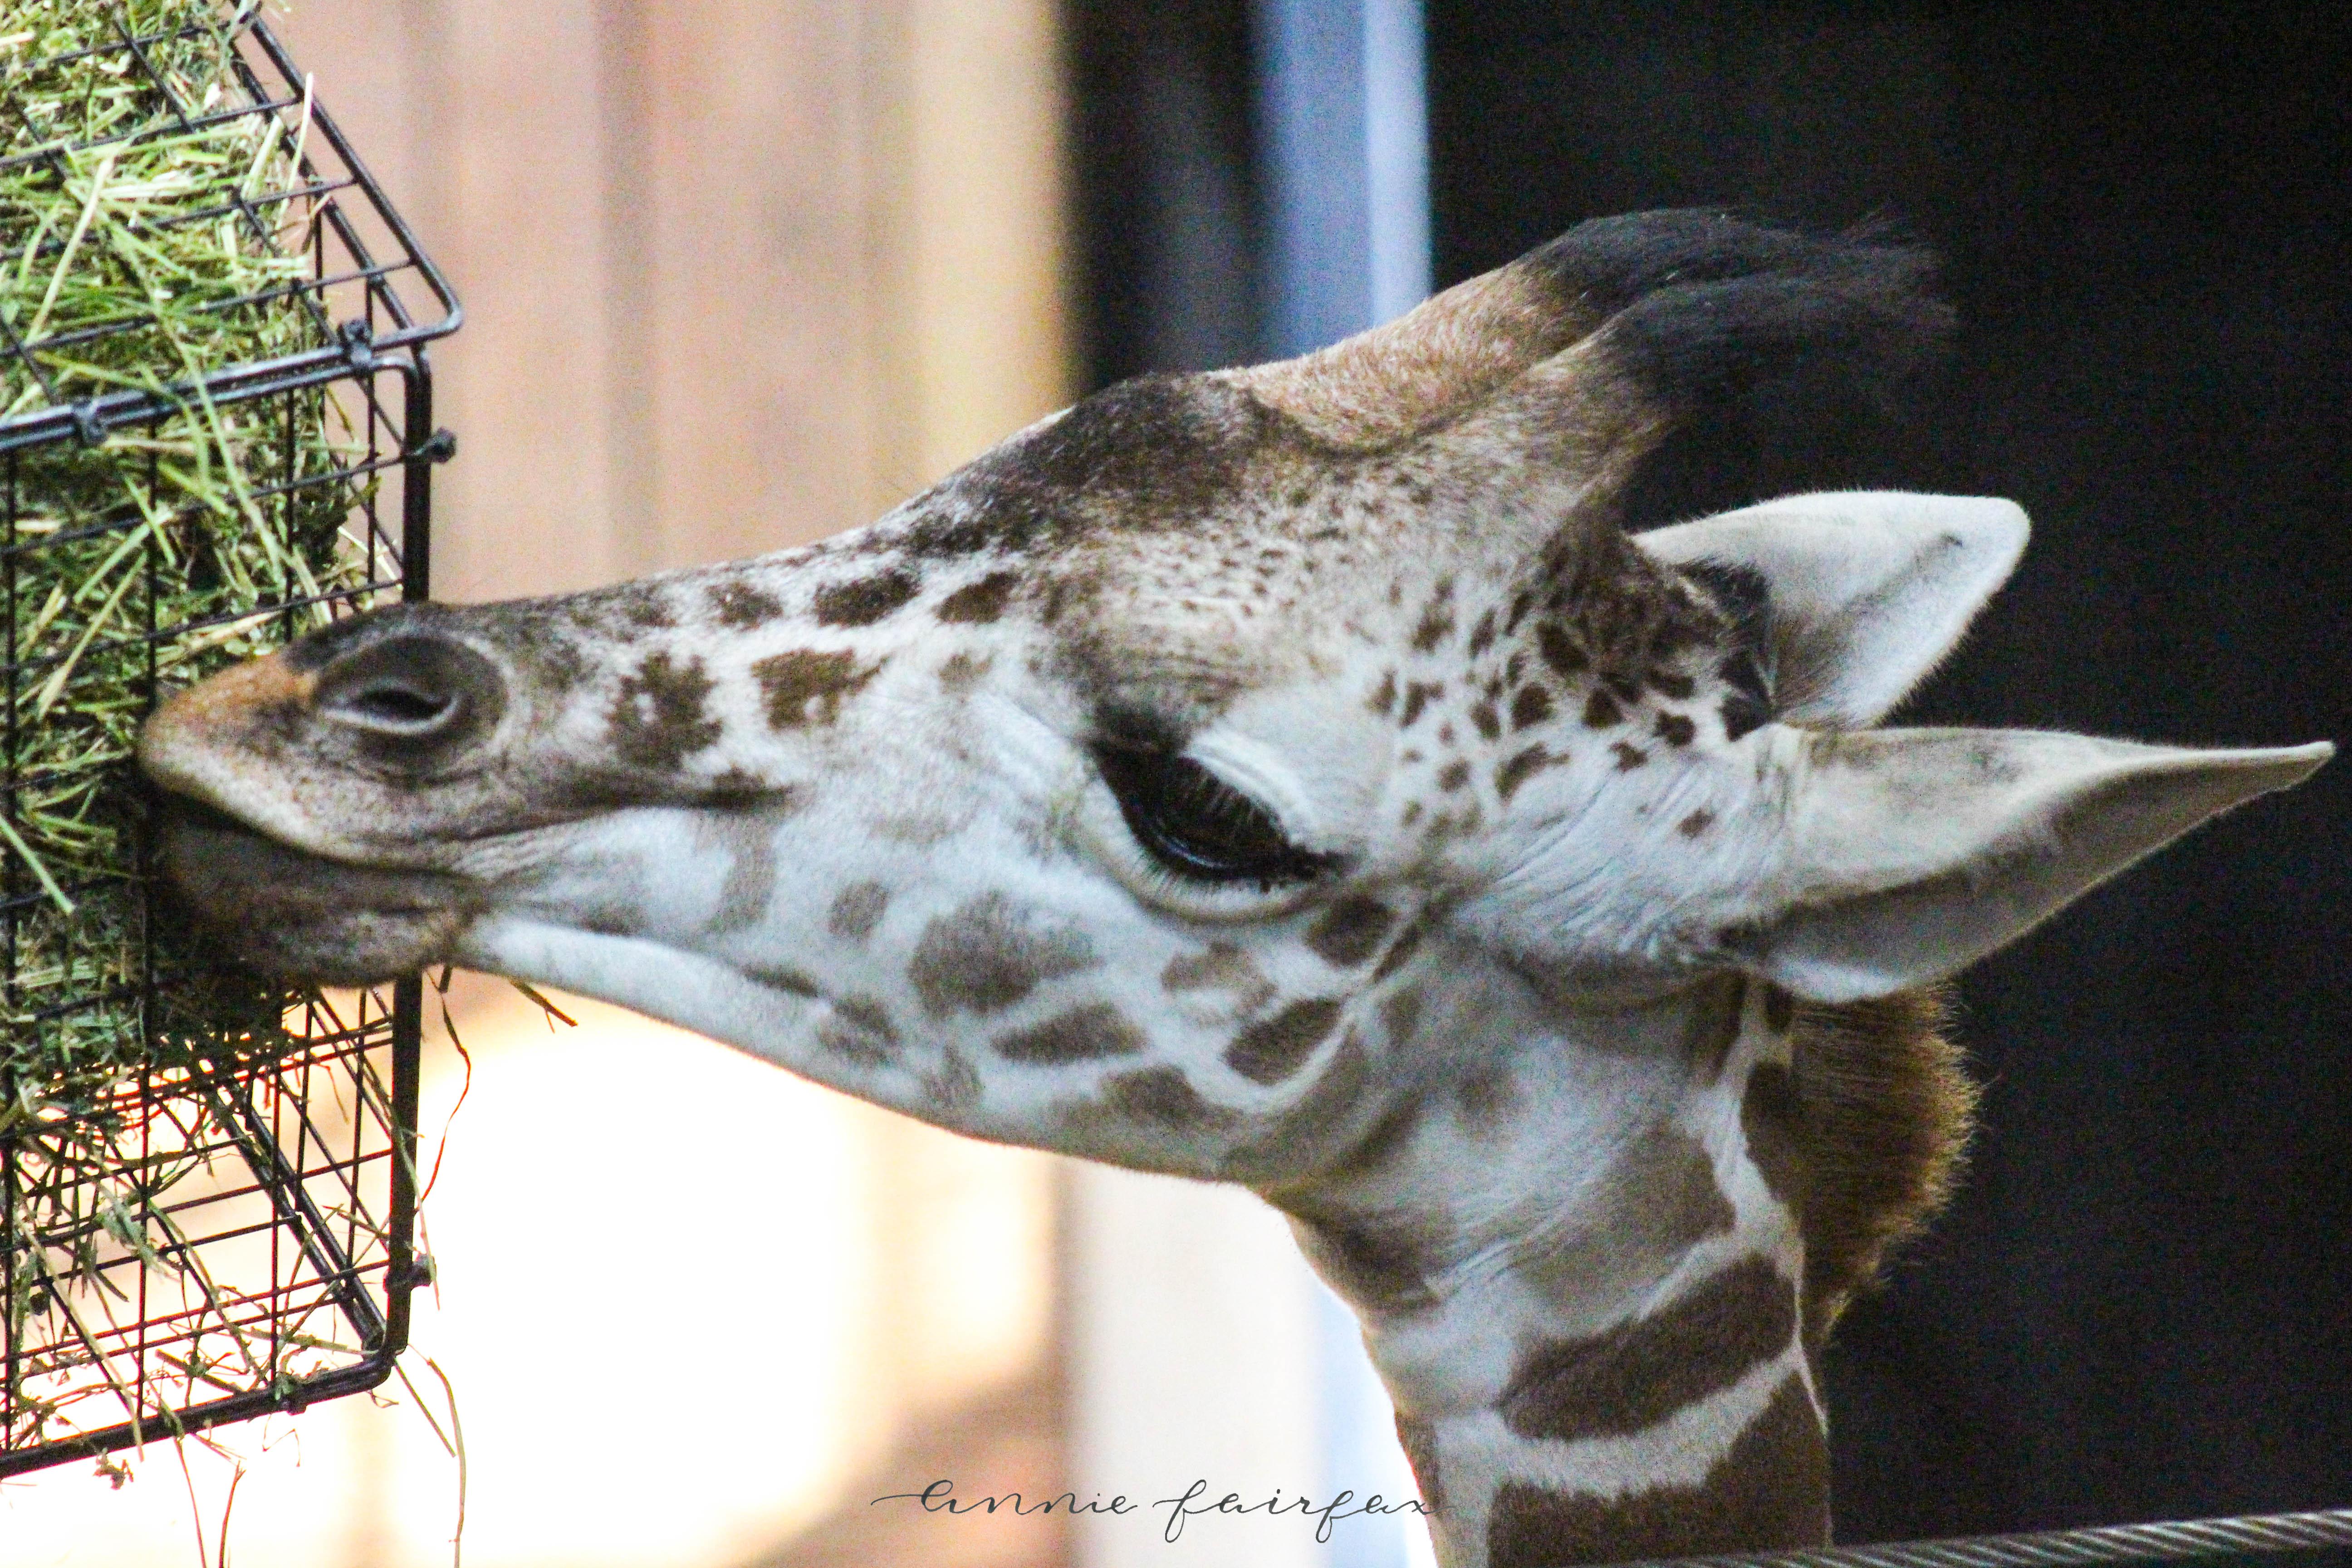 Giraffe via anniewearsit.com